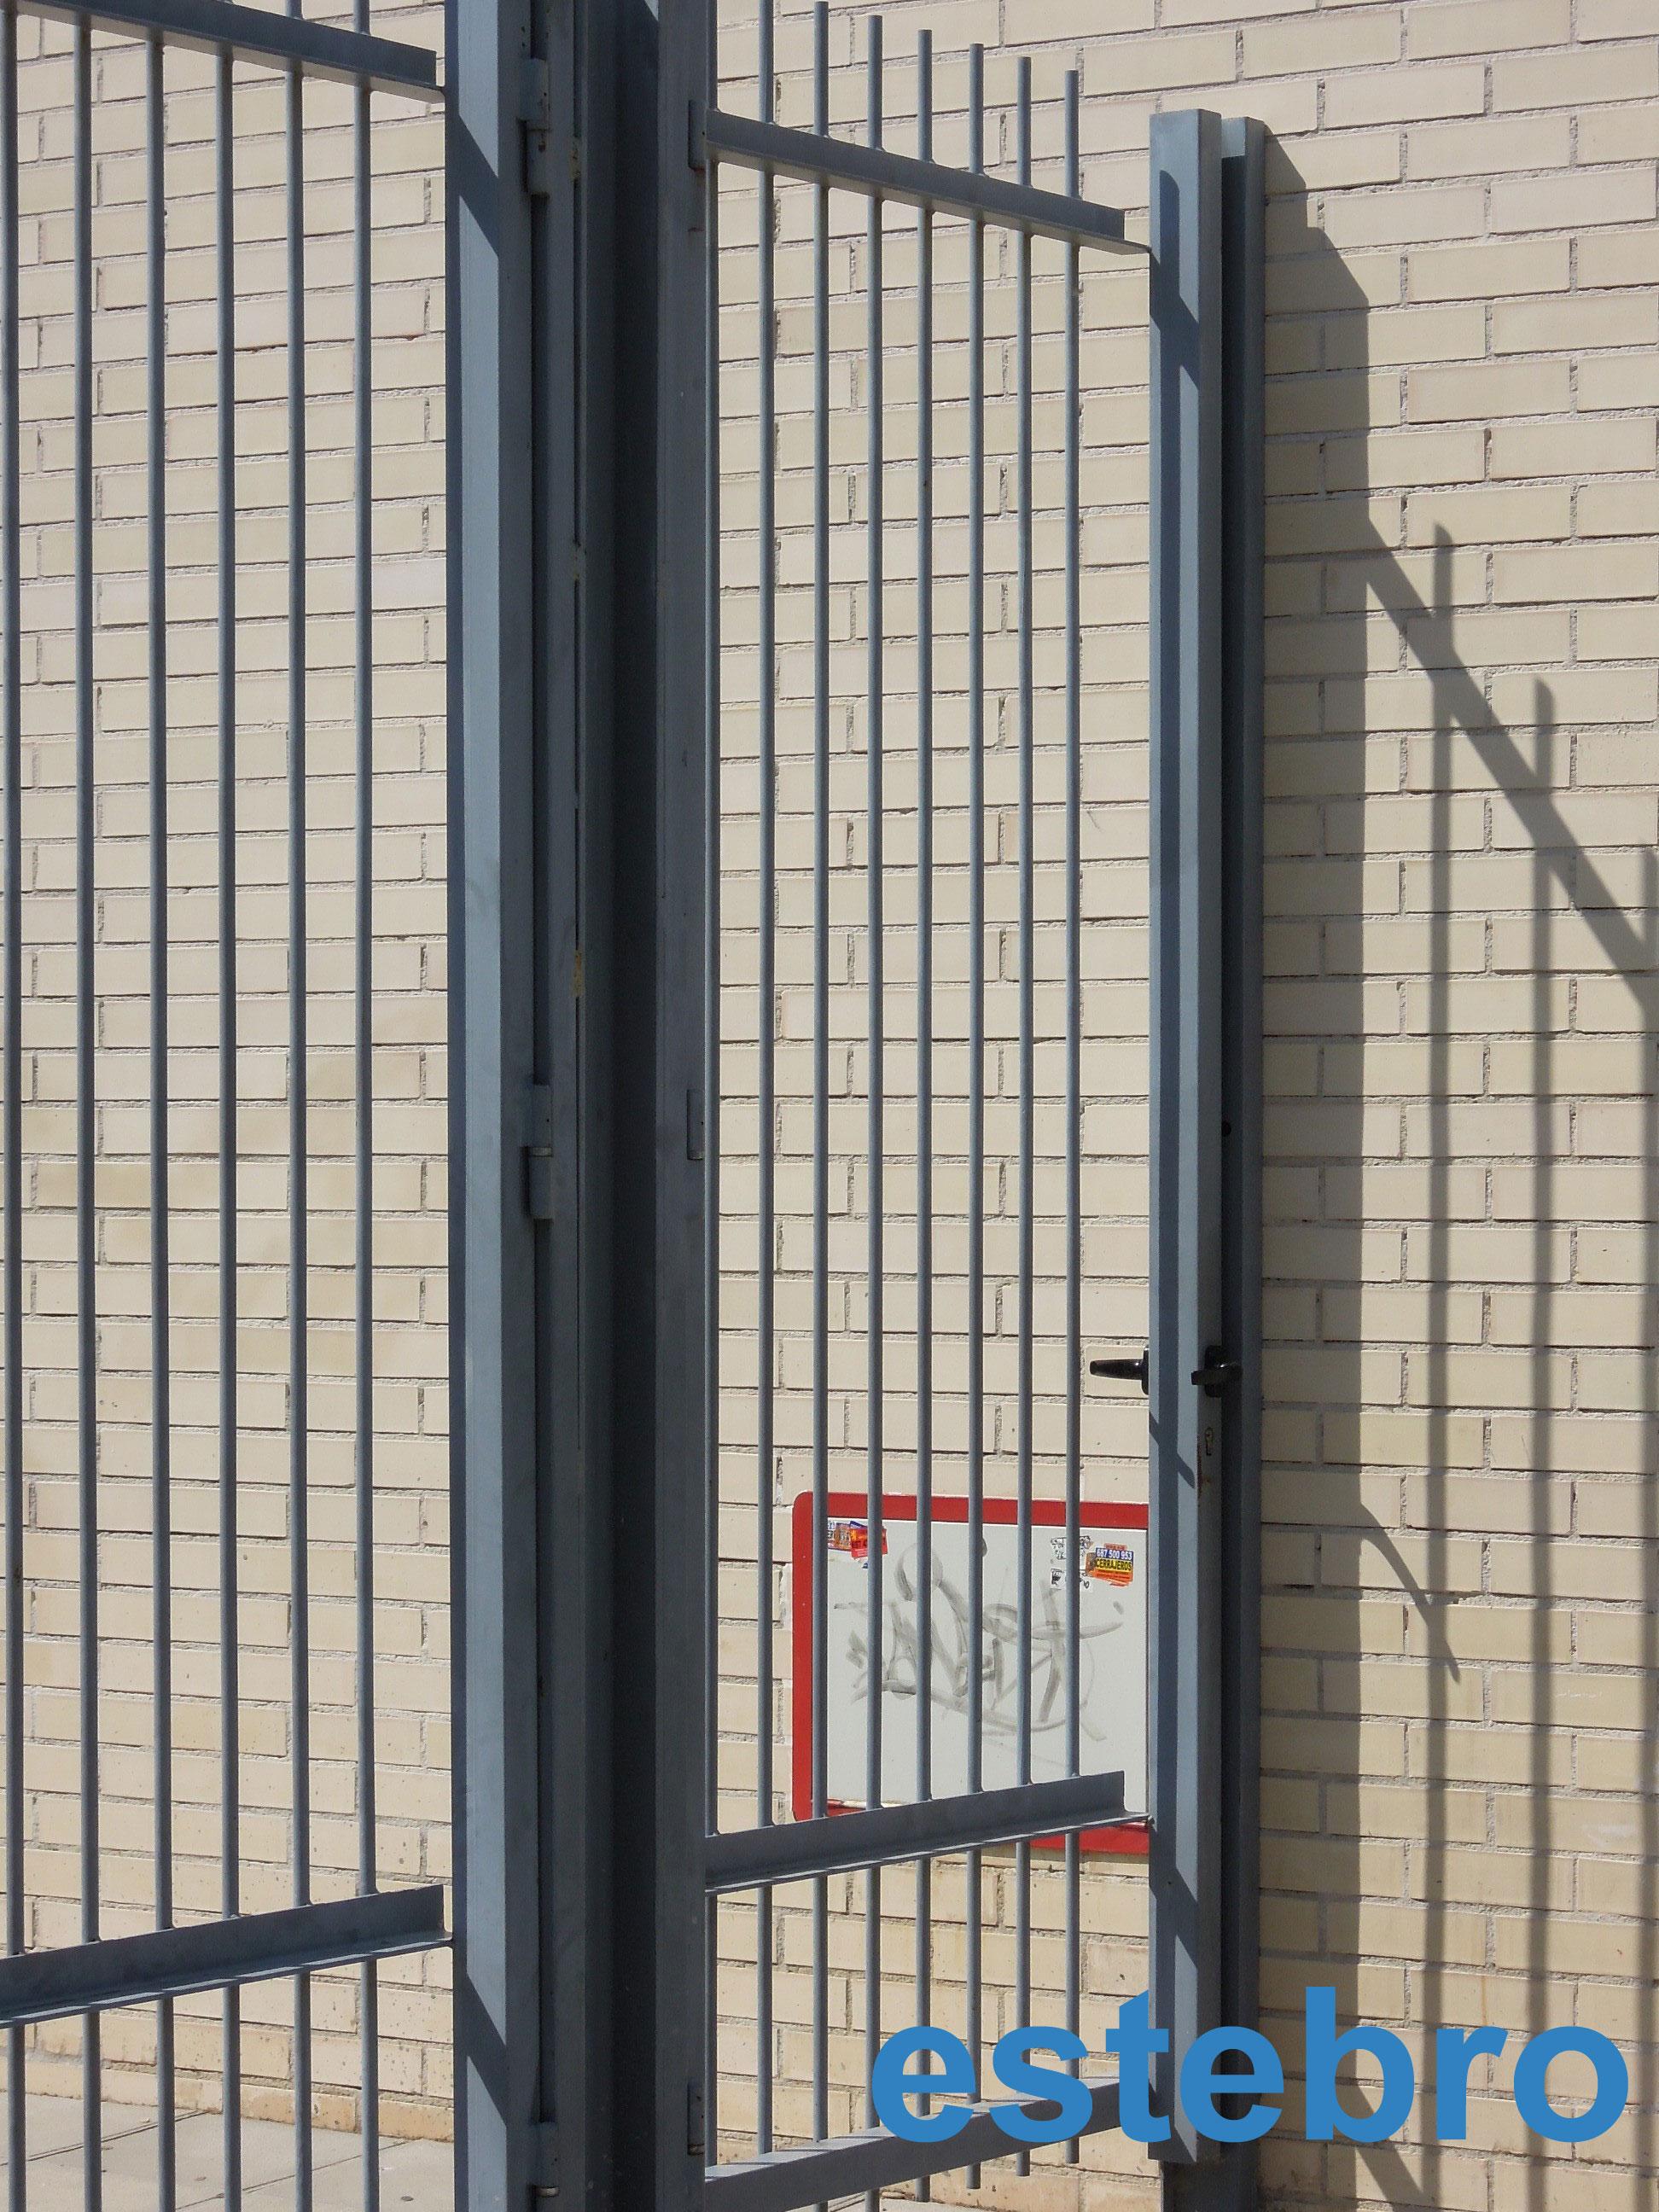 Pernios hierro herrajes puertas for Herrajes para puertas